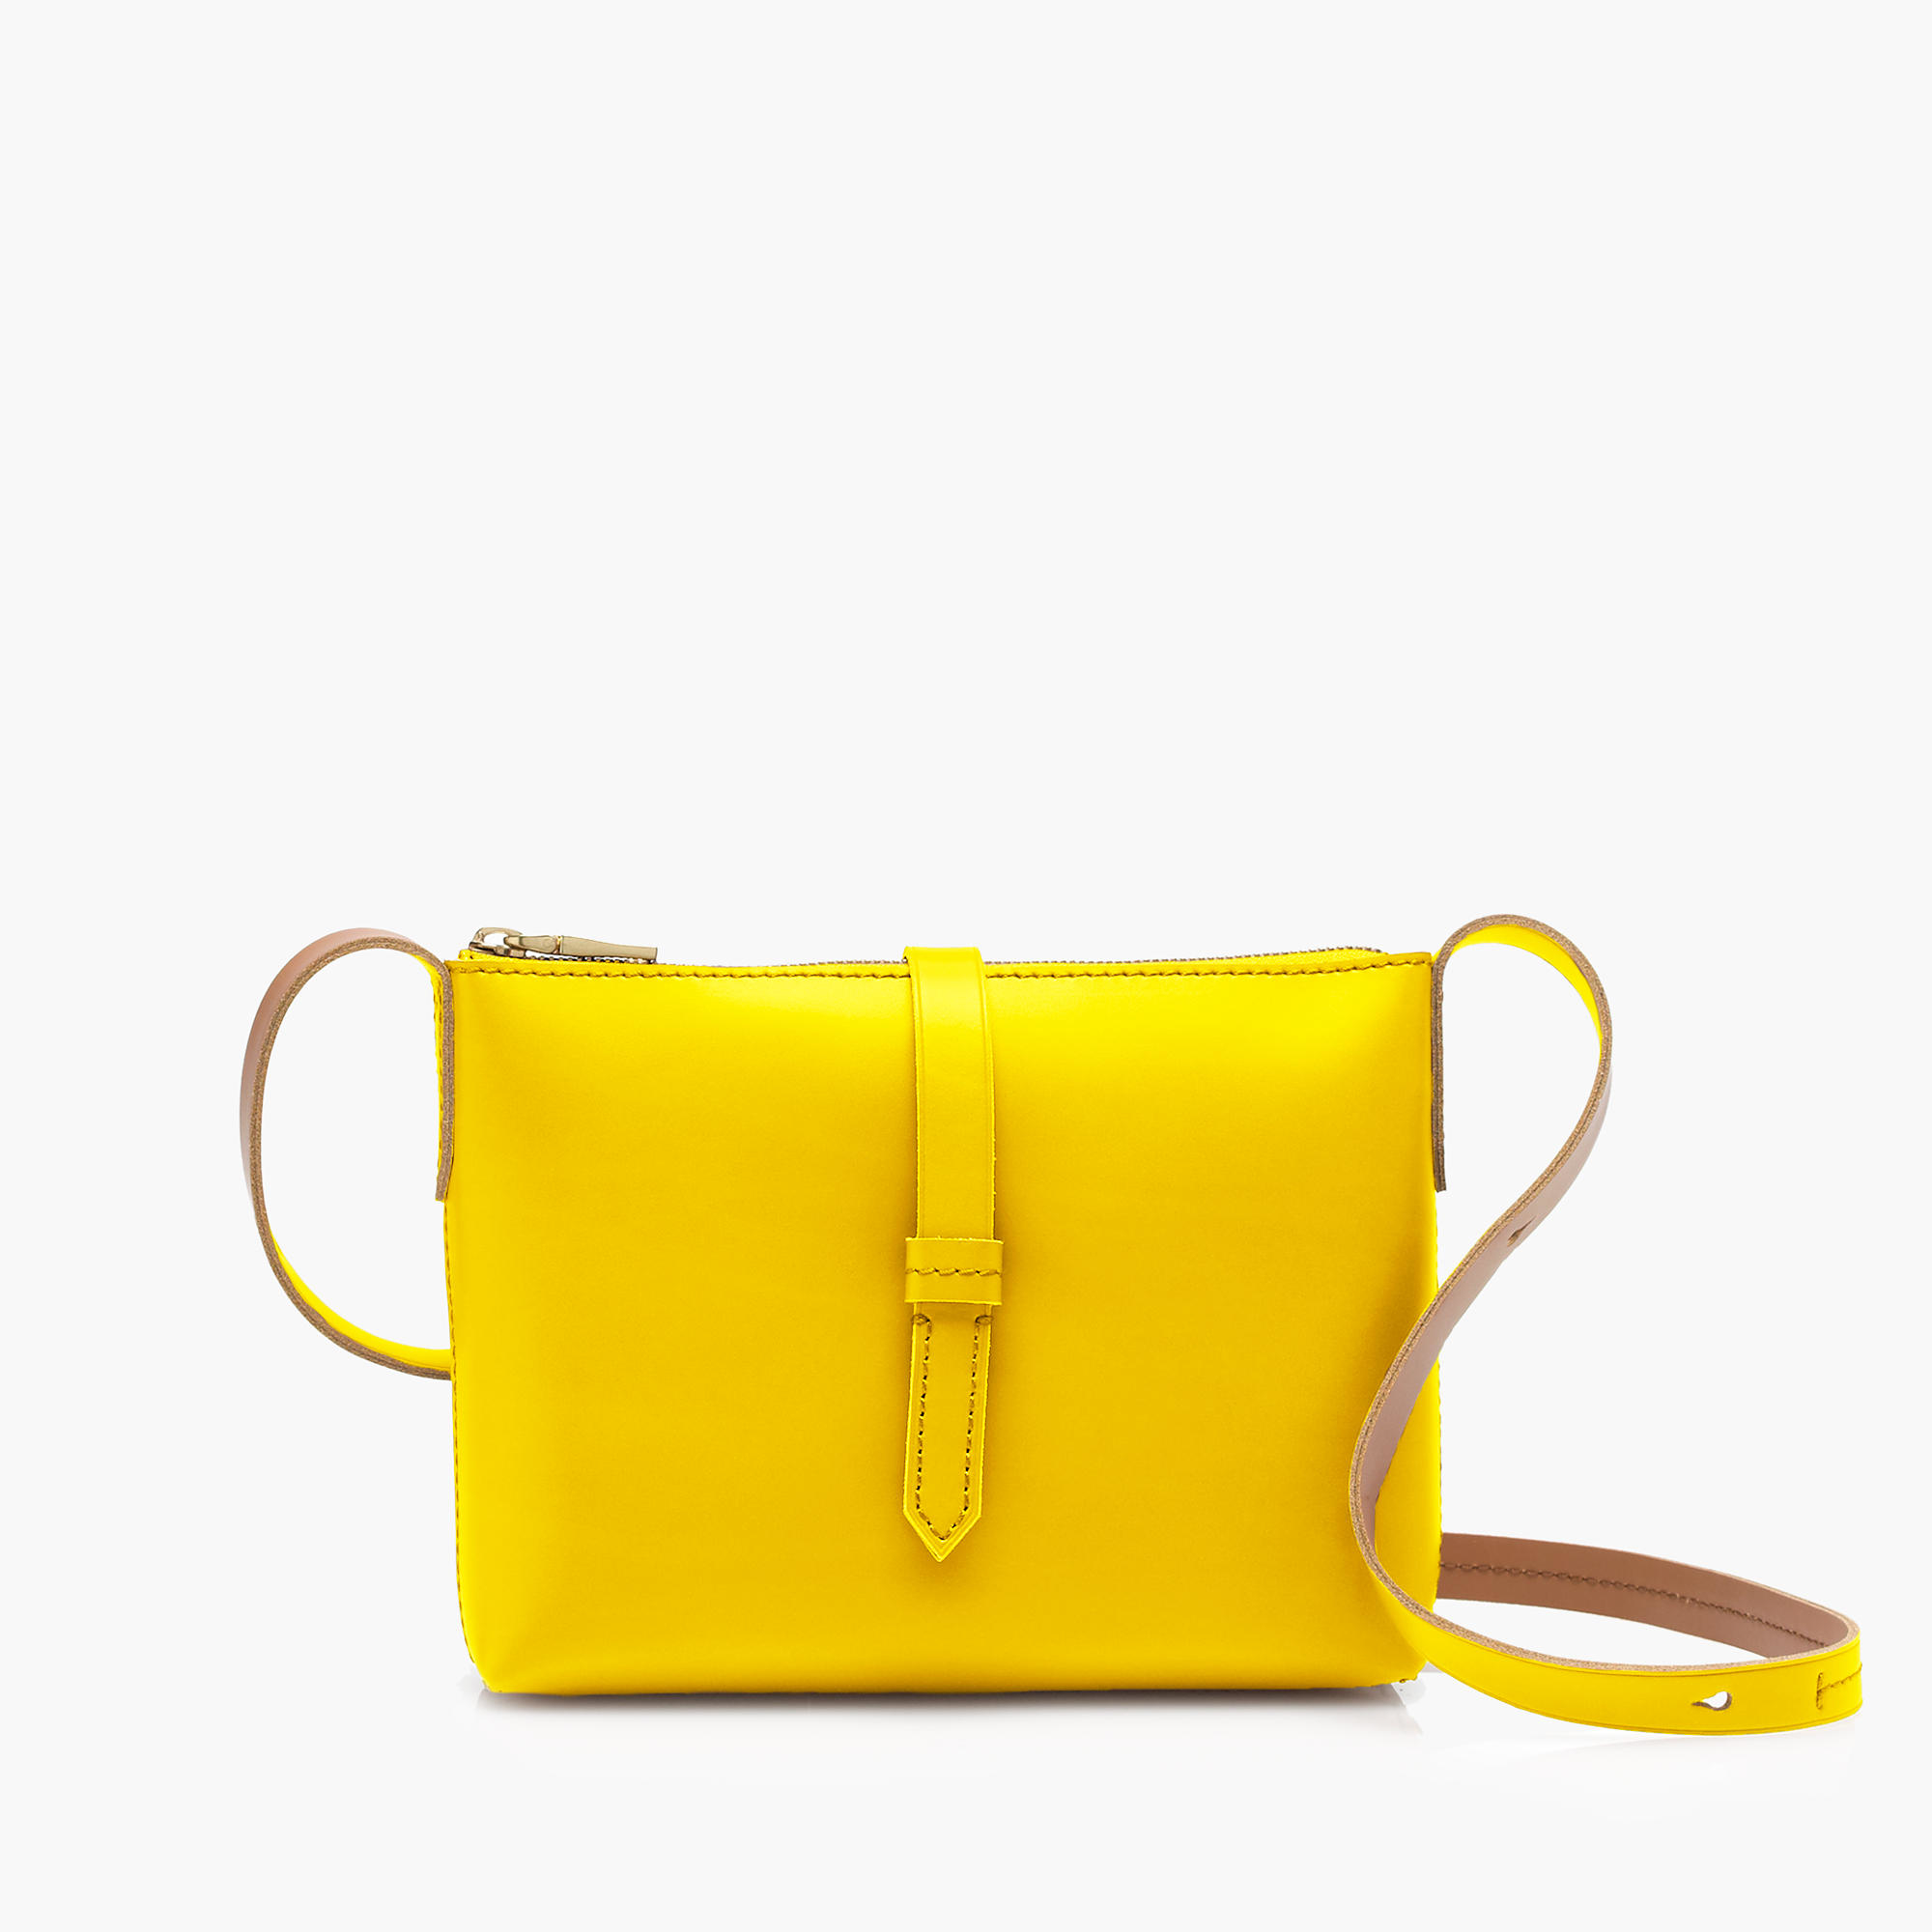 j crew crossbody bag in yellow lyst